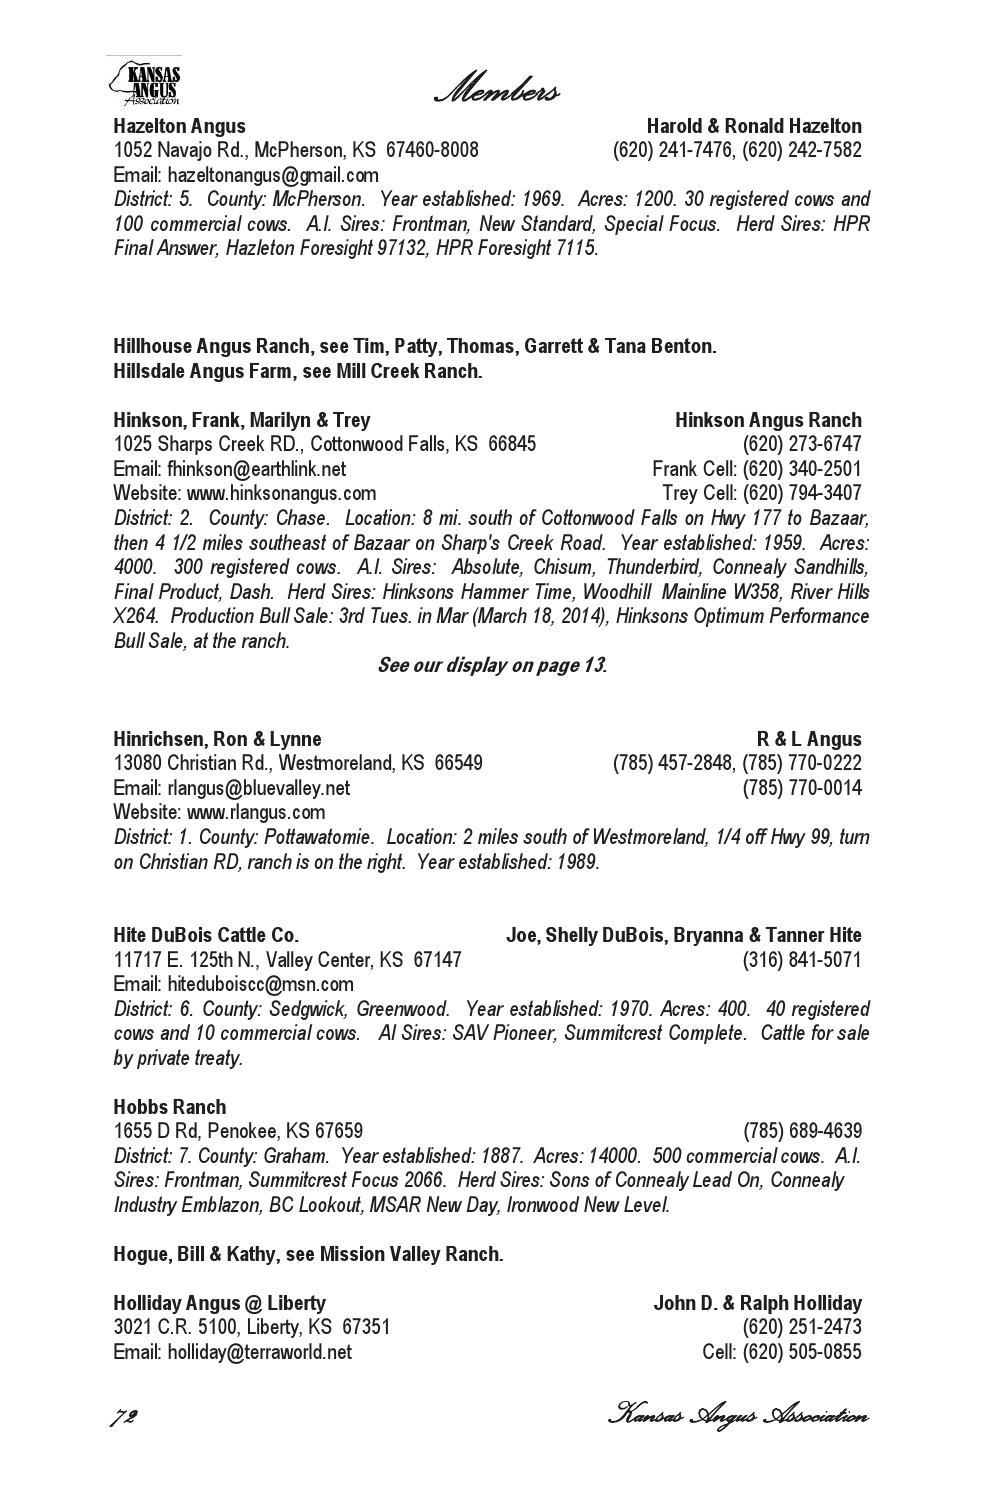 Kansas pottawatomie county westmoreland - Kansas Angus Association 2014 Membership Directory By Livestockdirect Issuu